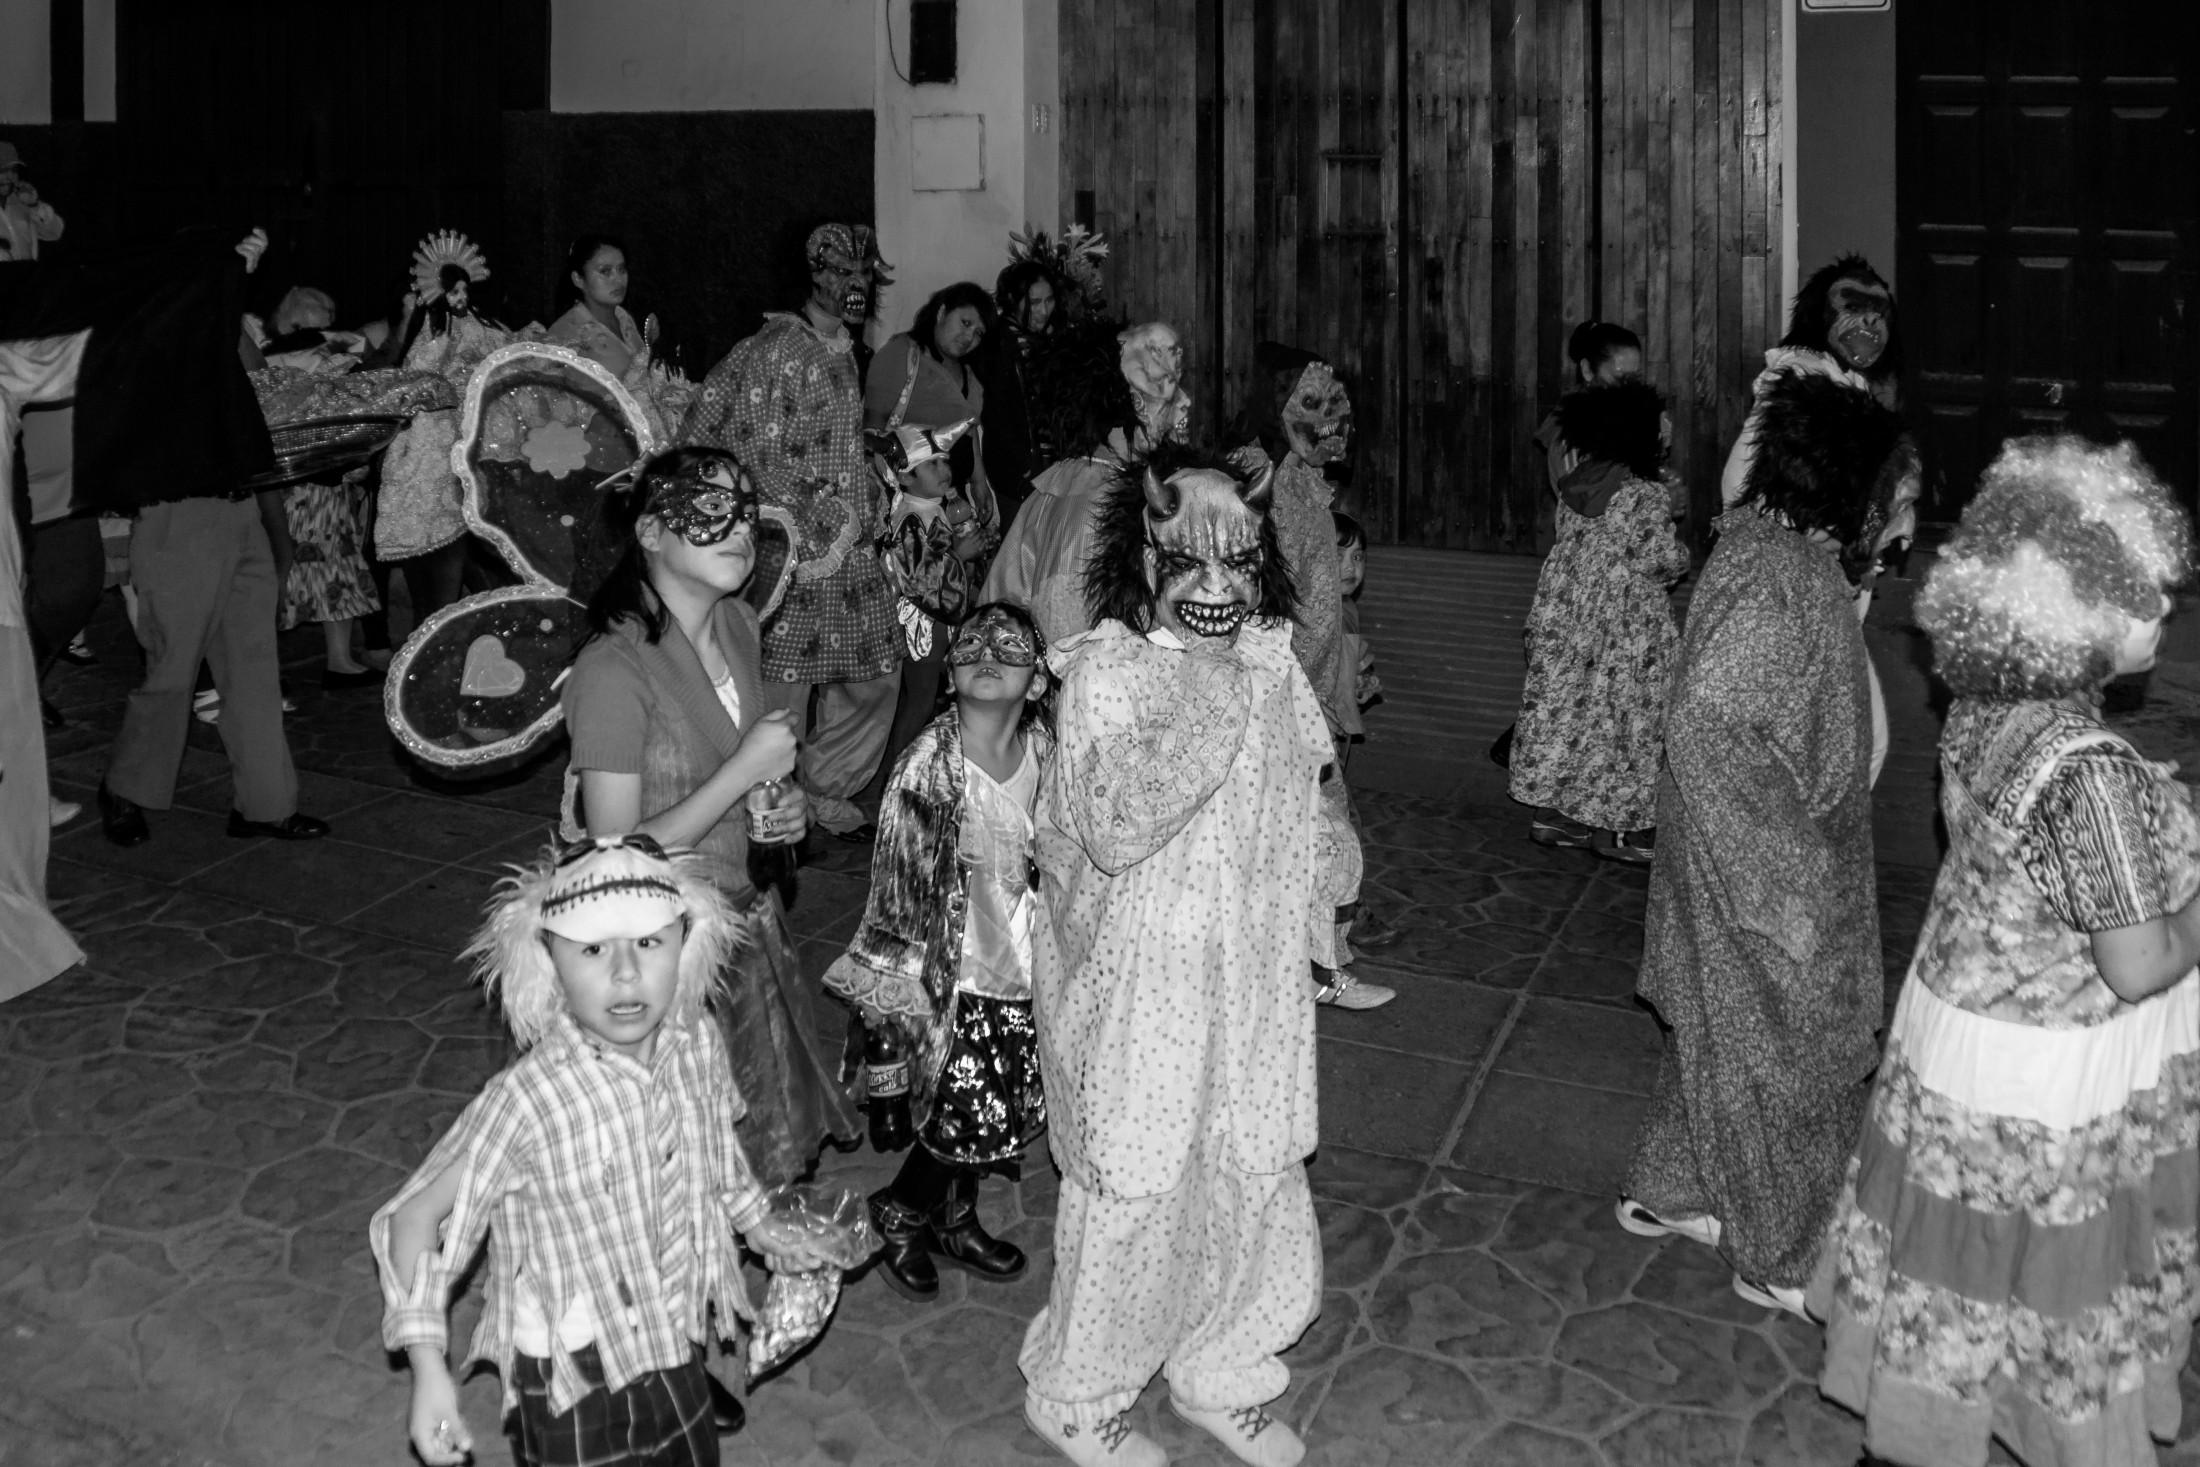 Carnival Mexico